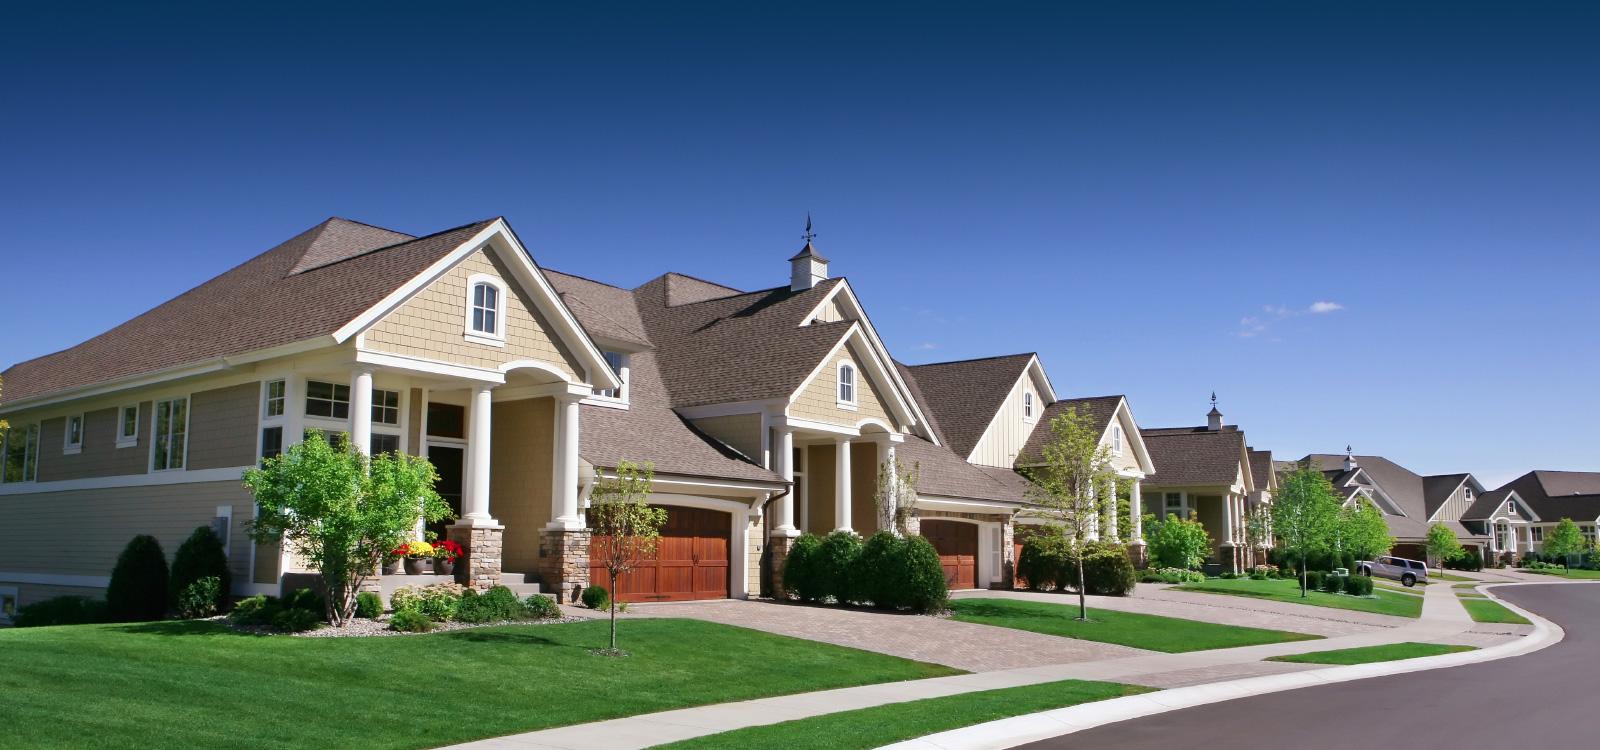 Home Inspection Checklist in Lorain